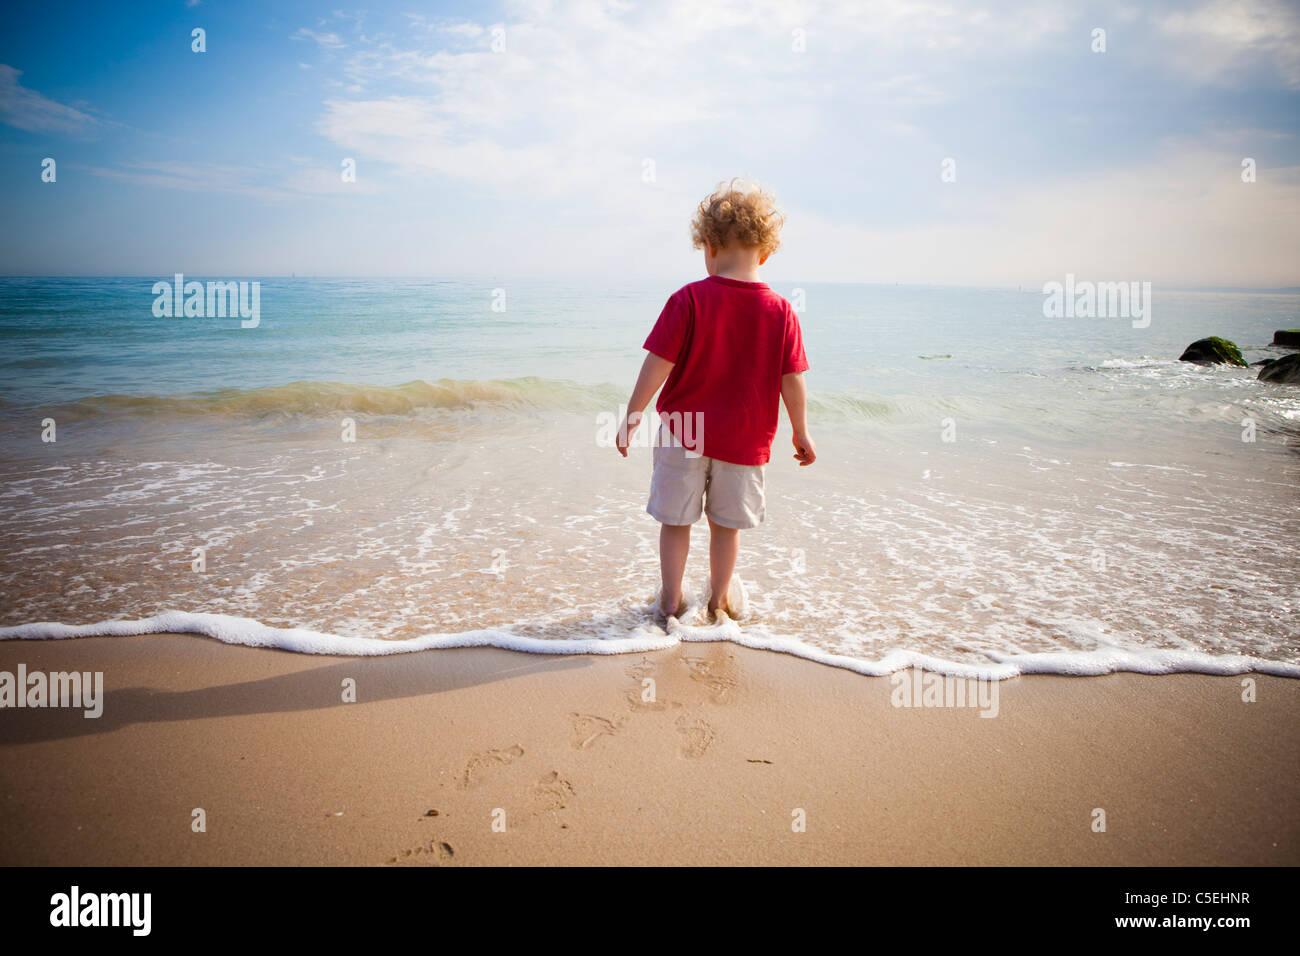 Garçon debout dans la mer Photo Stock